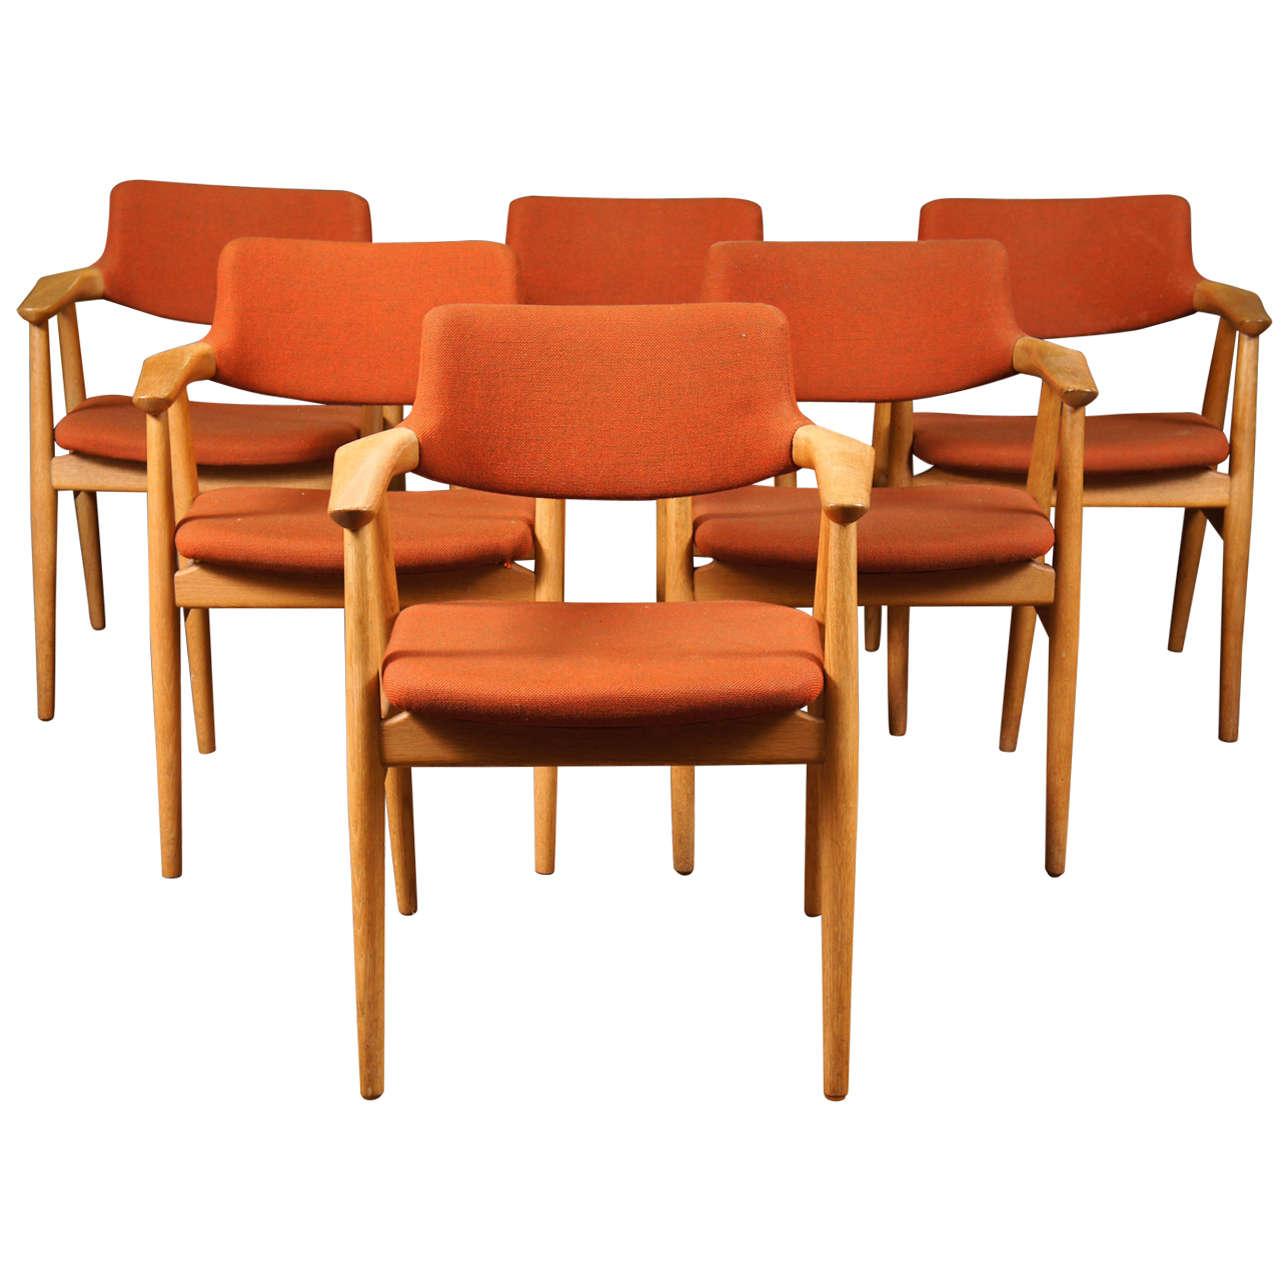 Orange dining chairs - Six Danish Modern Dining Chairs By Erik Kirkegaard 1